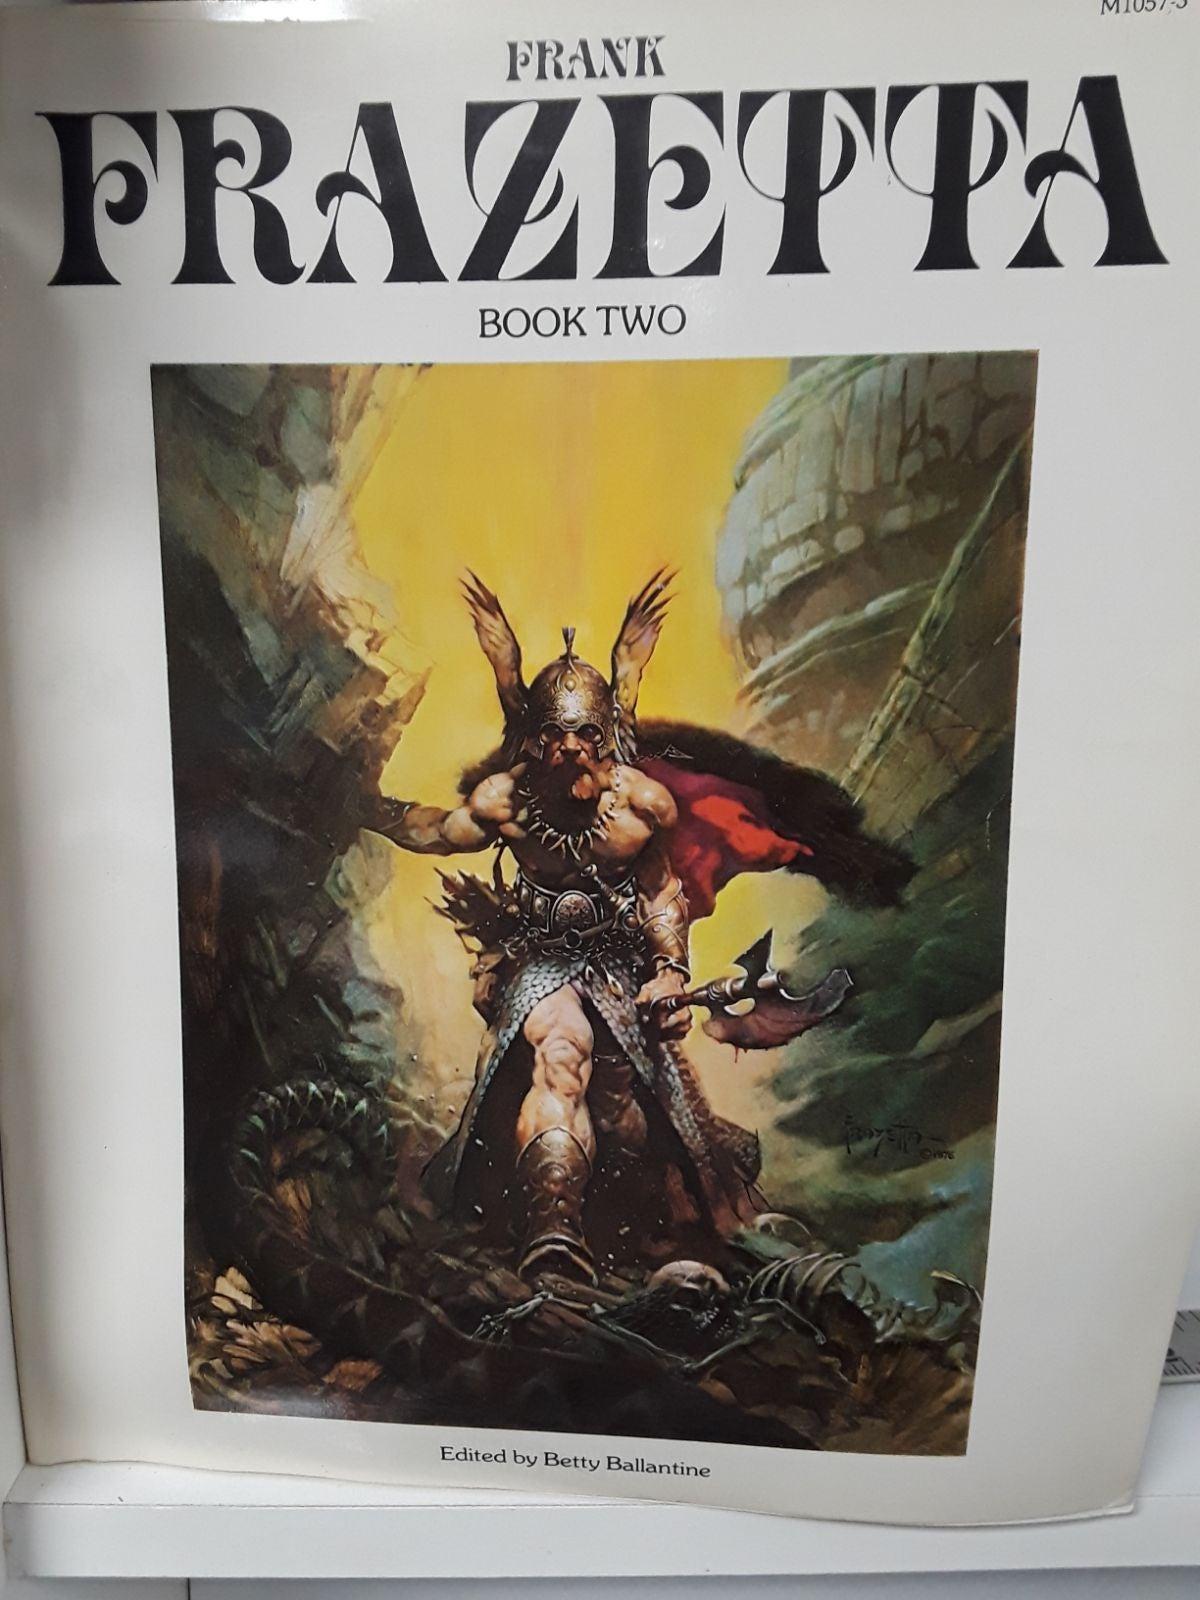 Fantastic Art of Frank Frazetta Book 2